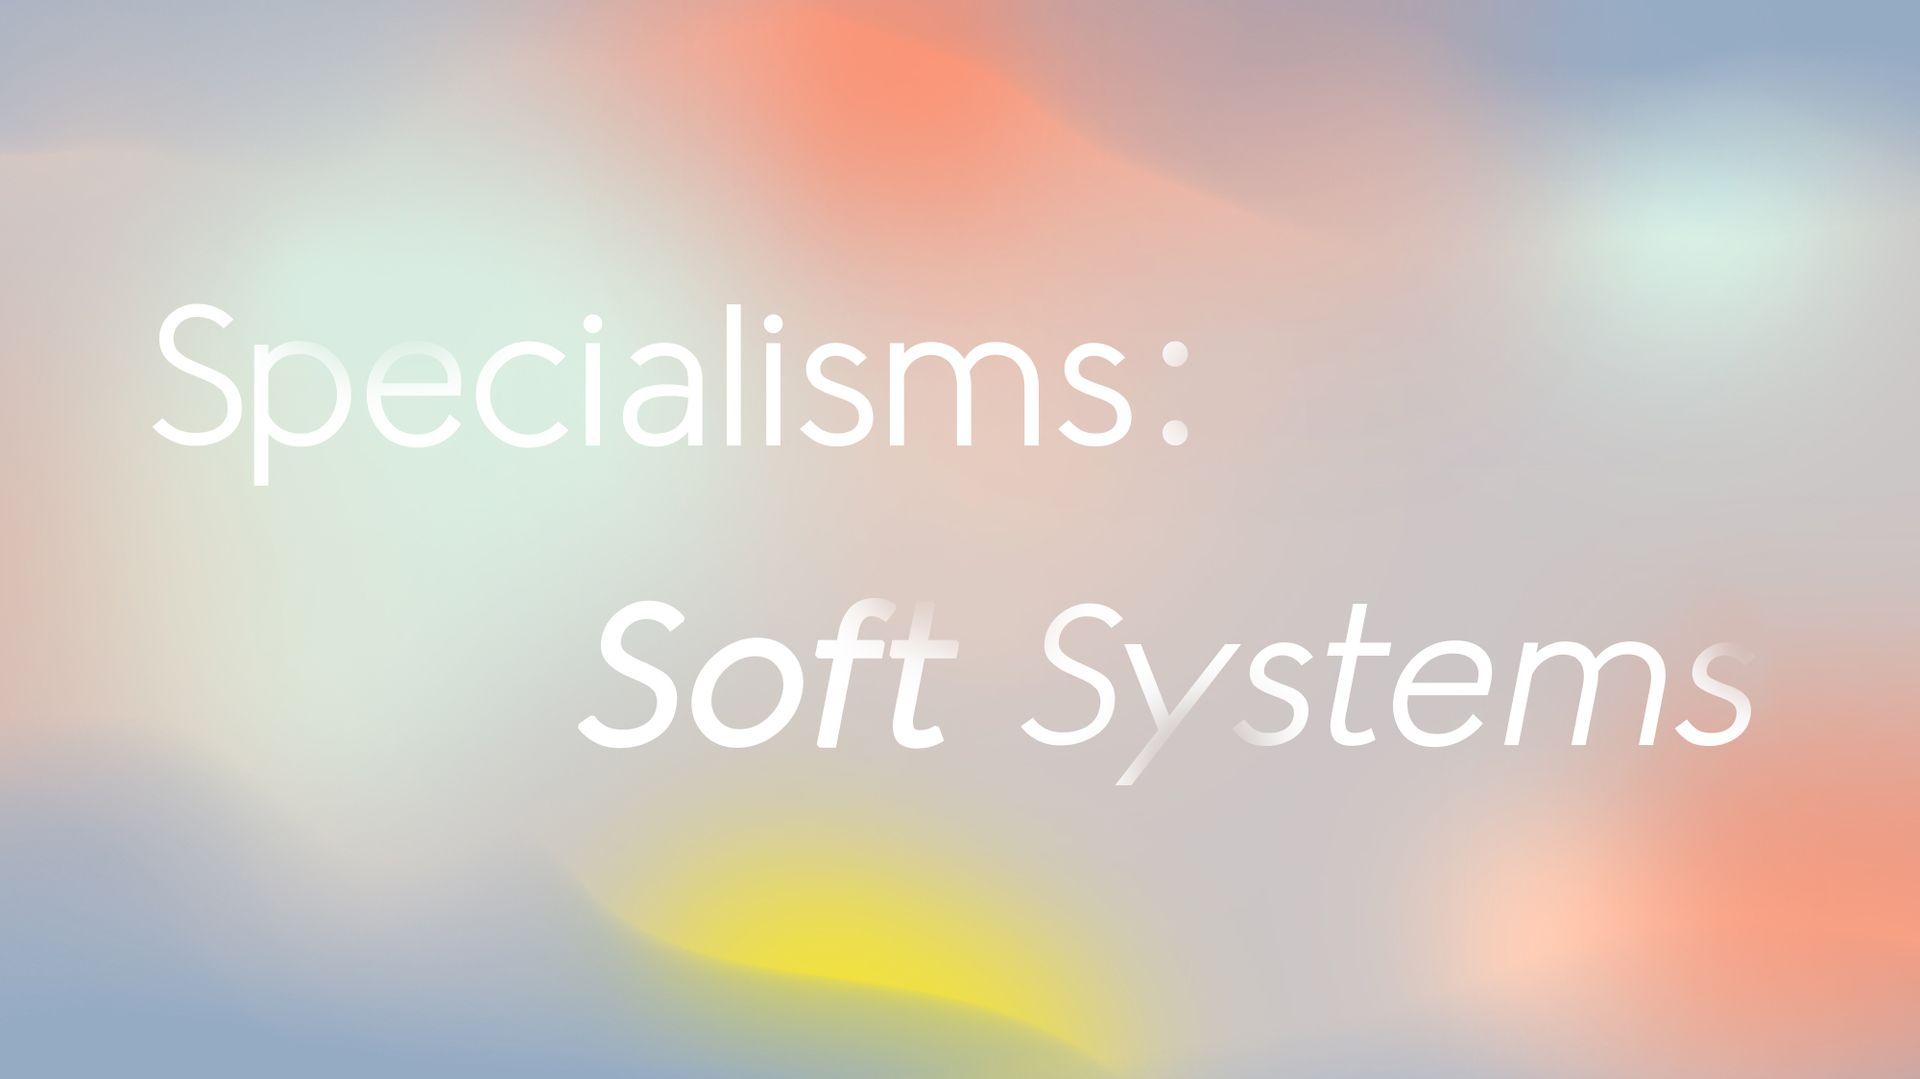 Specialisms: Soft System